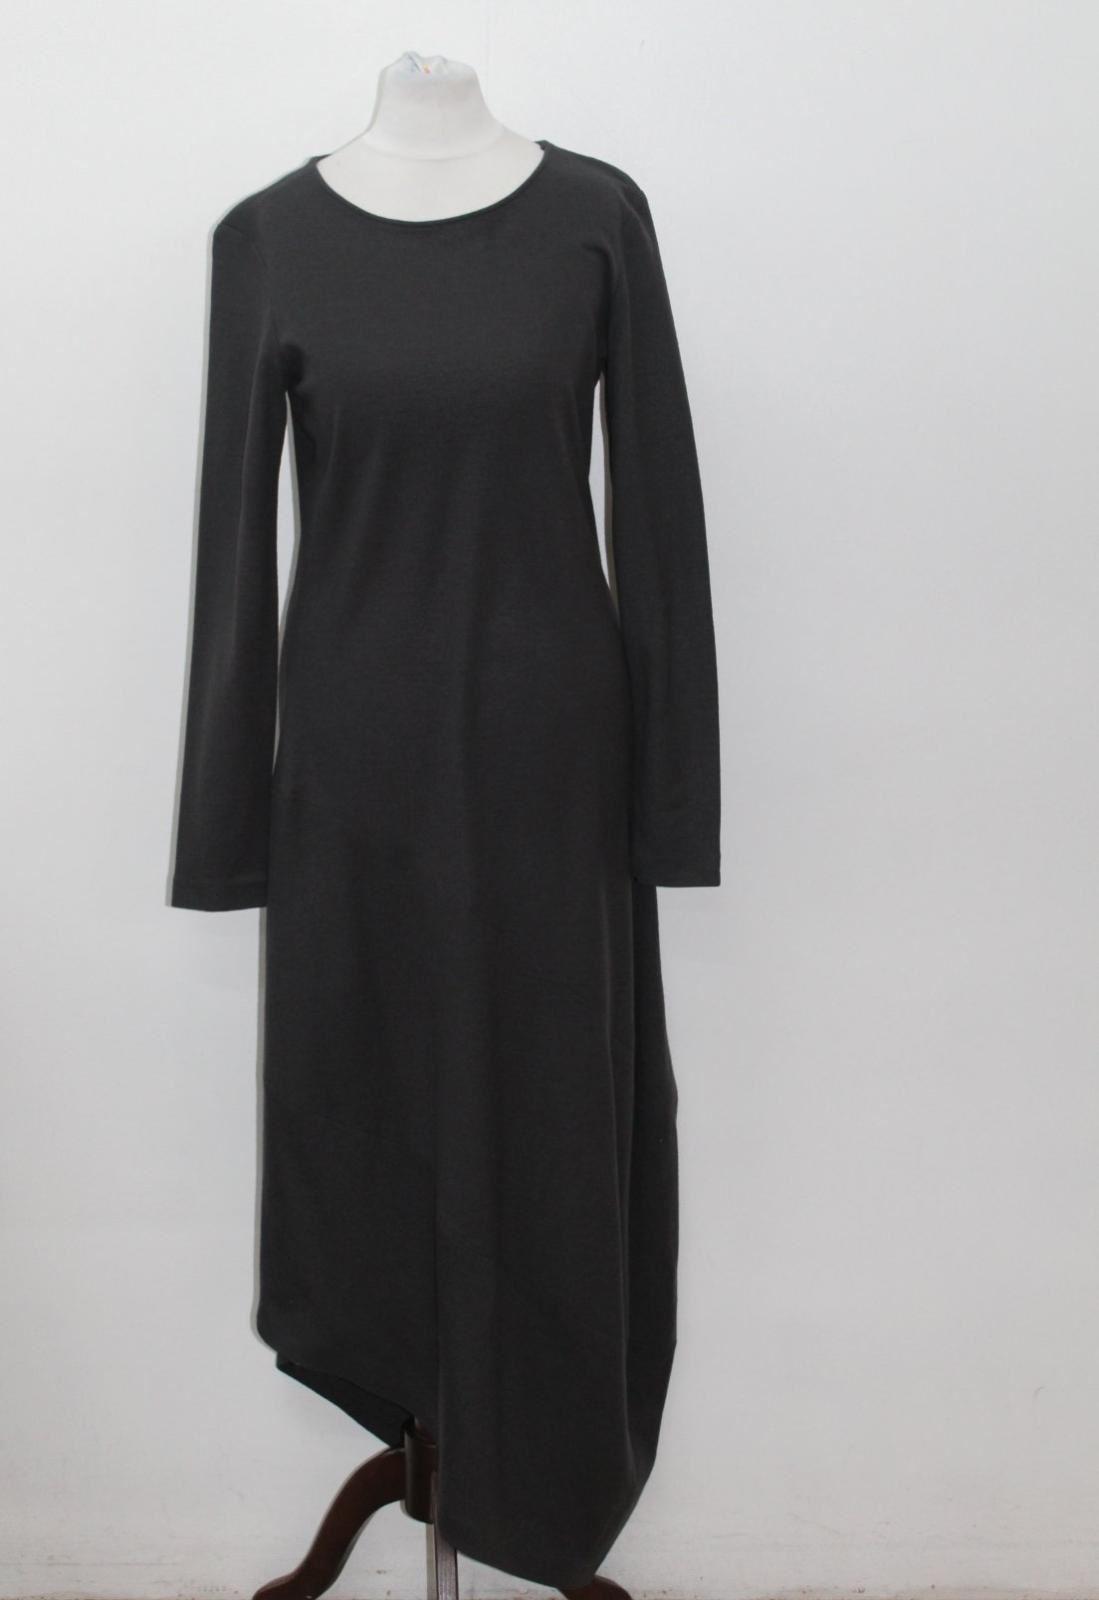 NICOLE FARHI Ladies Grey Wool Long Sleeve Asymmetric Hem Dress UK10 EU38